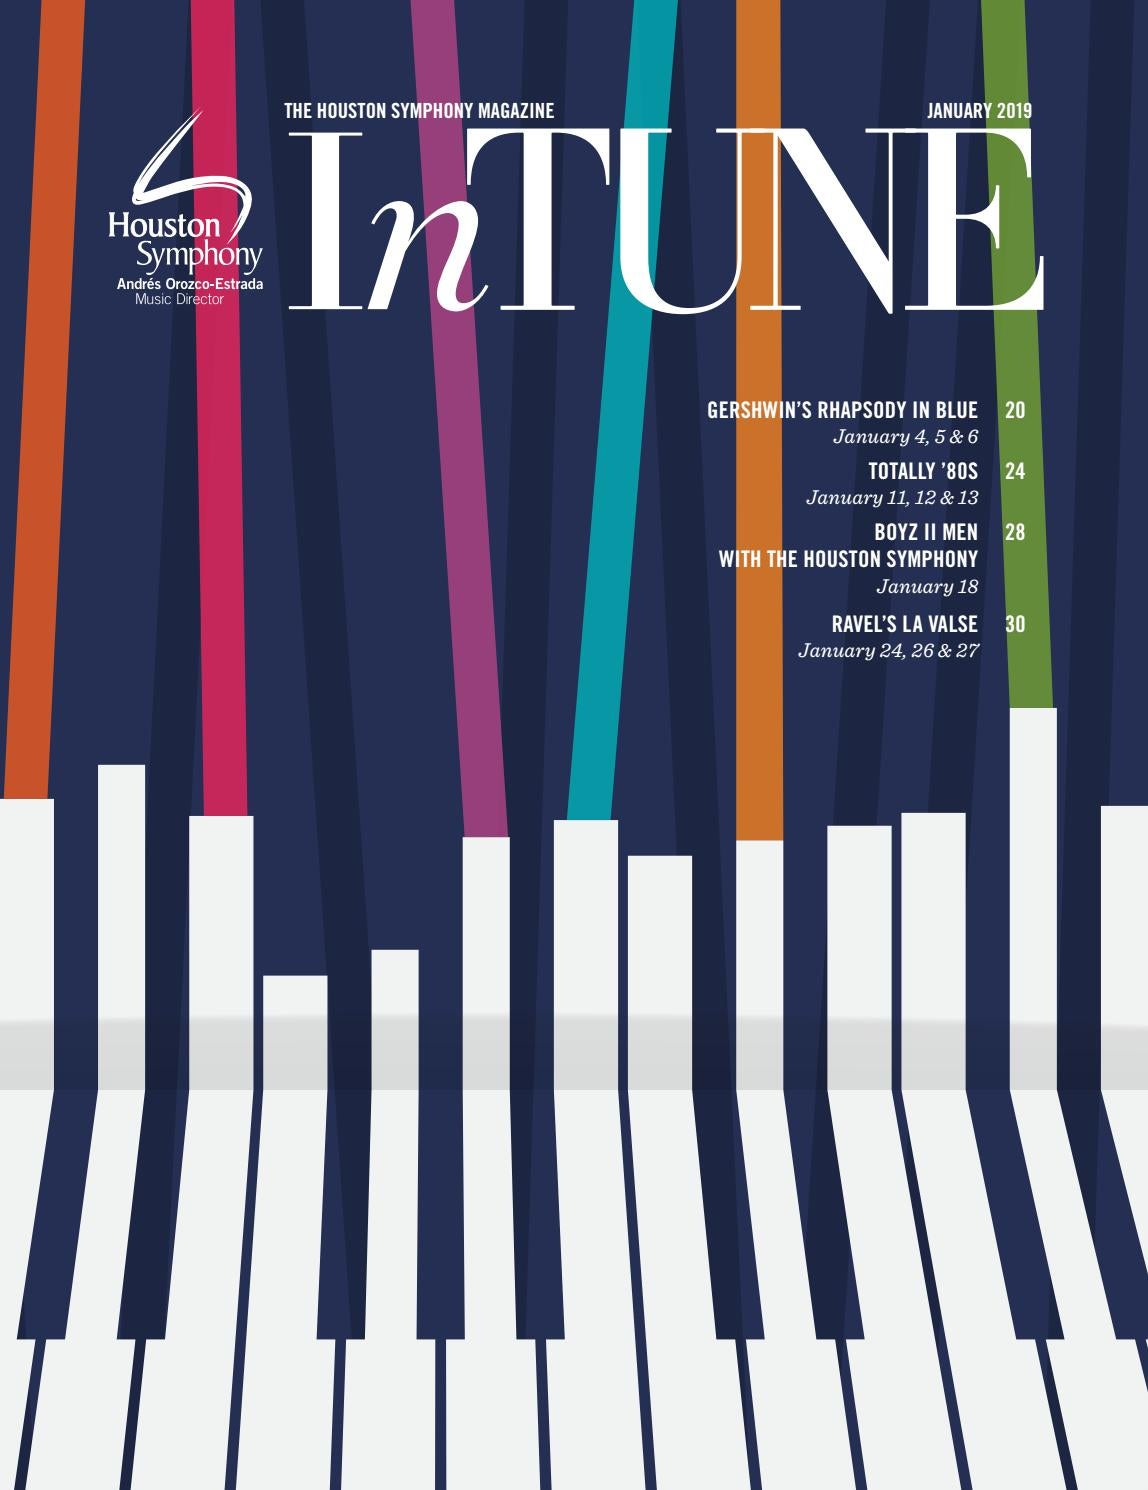 InTune — The Houston Symphony Magazine — January 2019 by